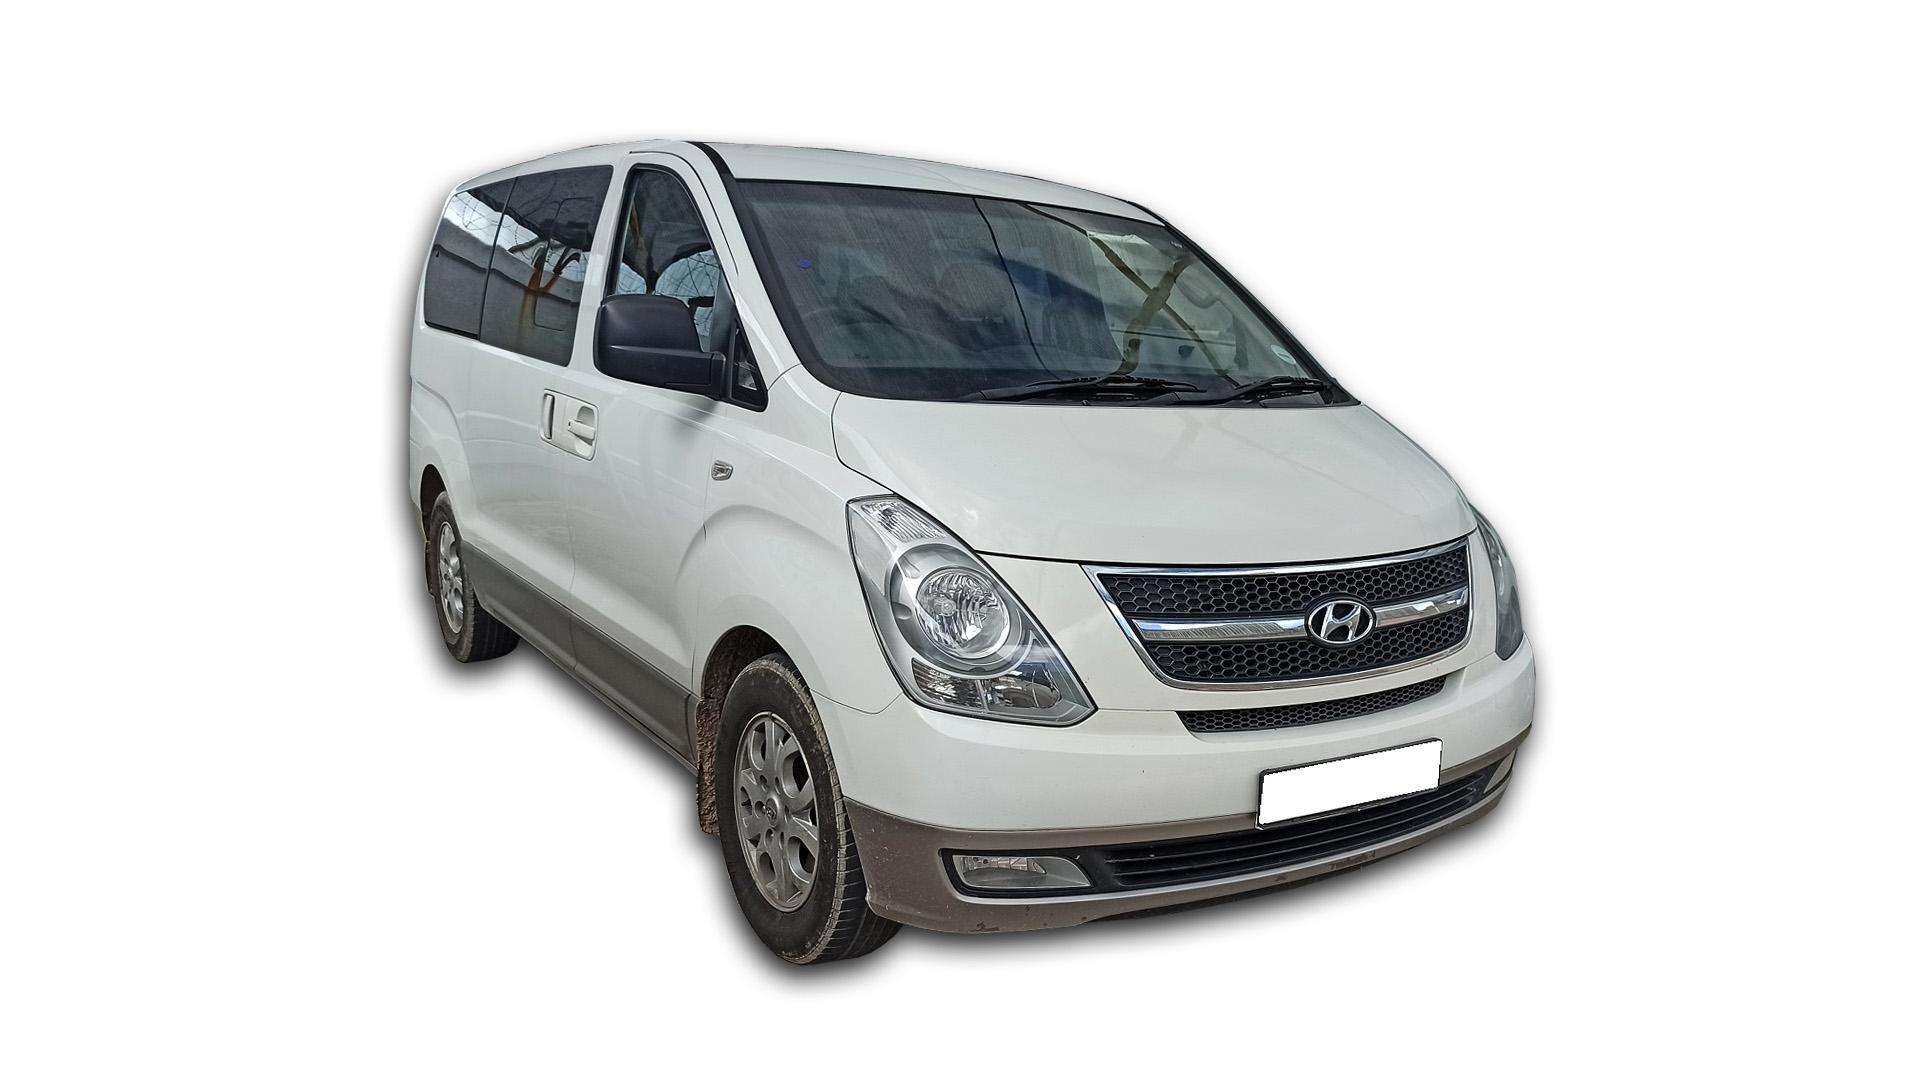 Hyundai H100 2.5 Crdi (VGT) Wag